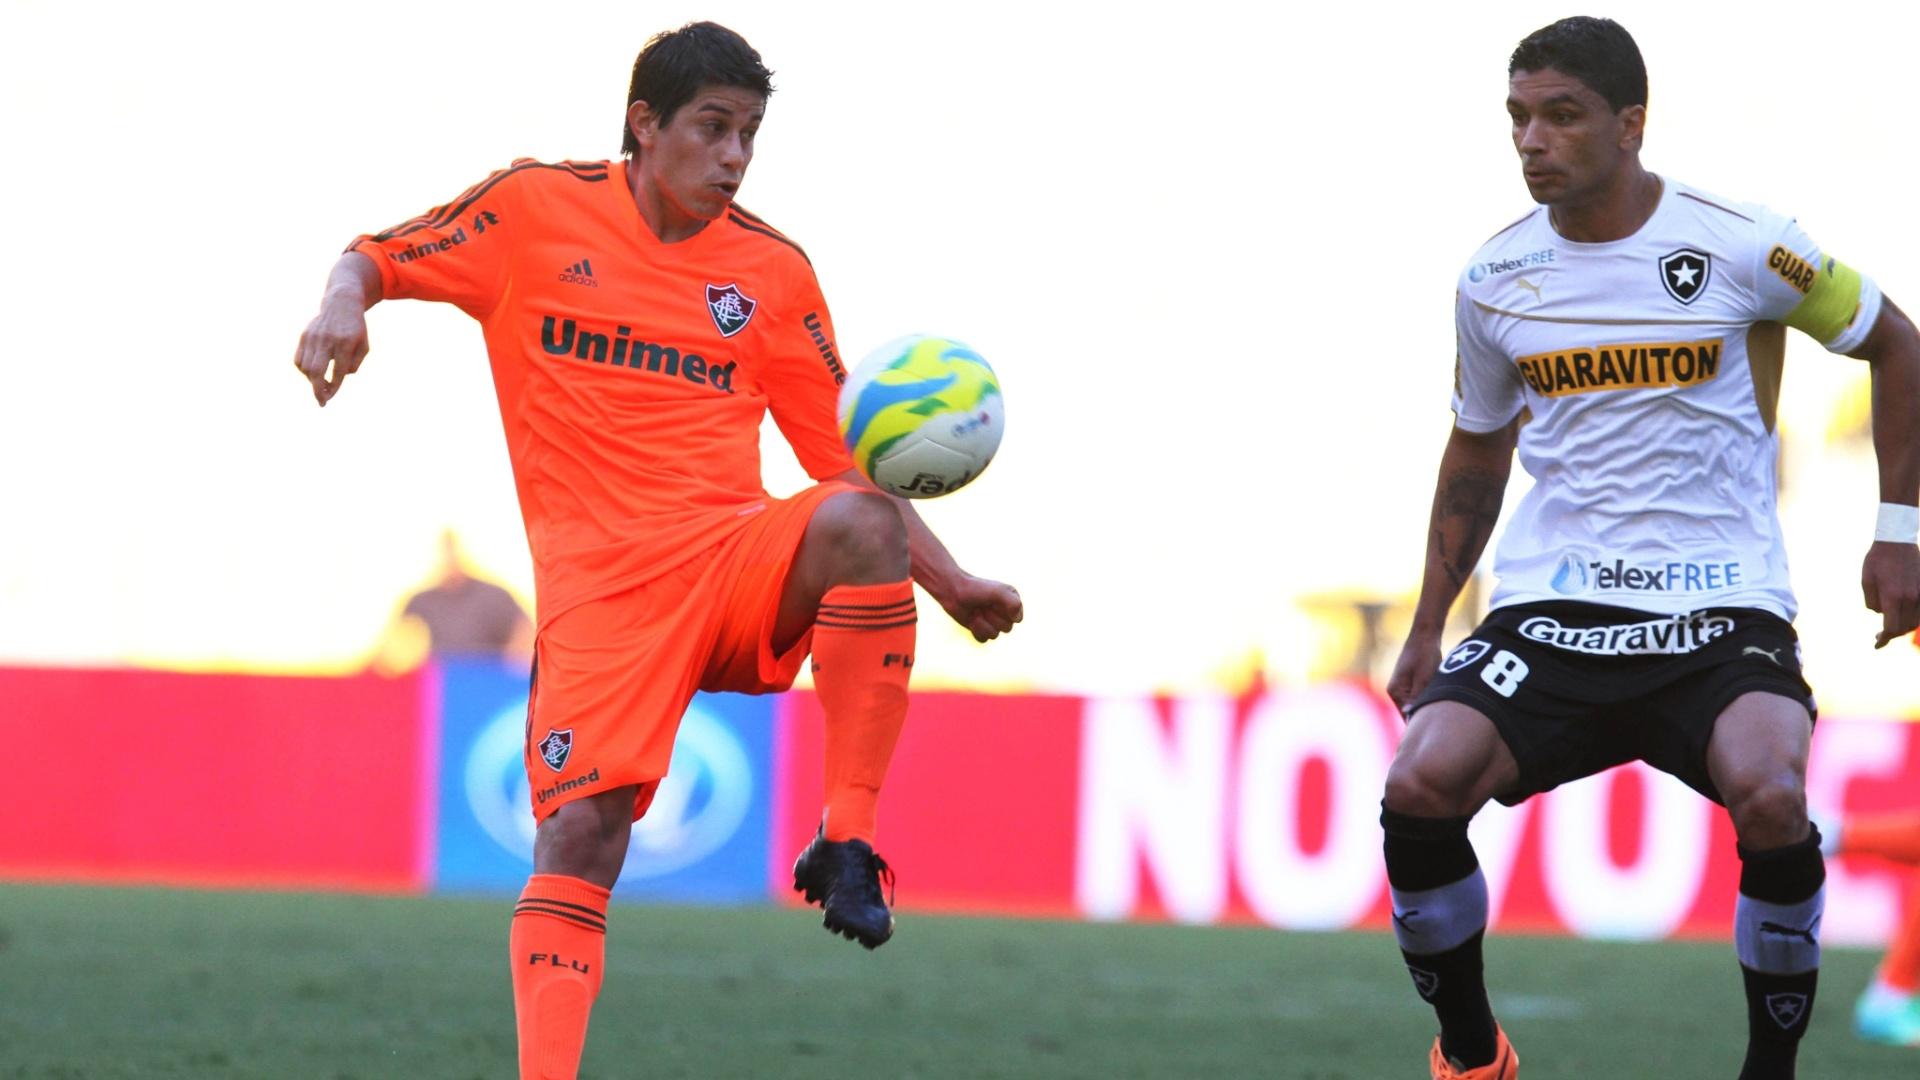 23.fev.2014 - Conca domina a bola observado de perto por Renato, do Botafogo, no clássico pelo Campeonato Carioca